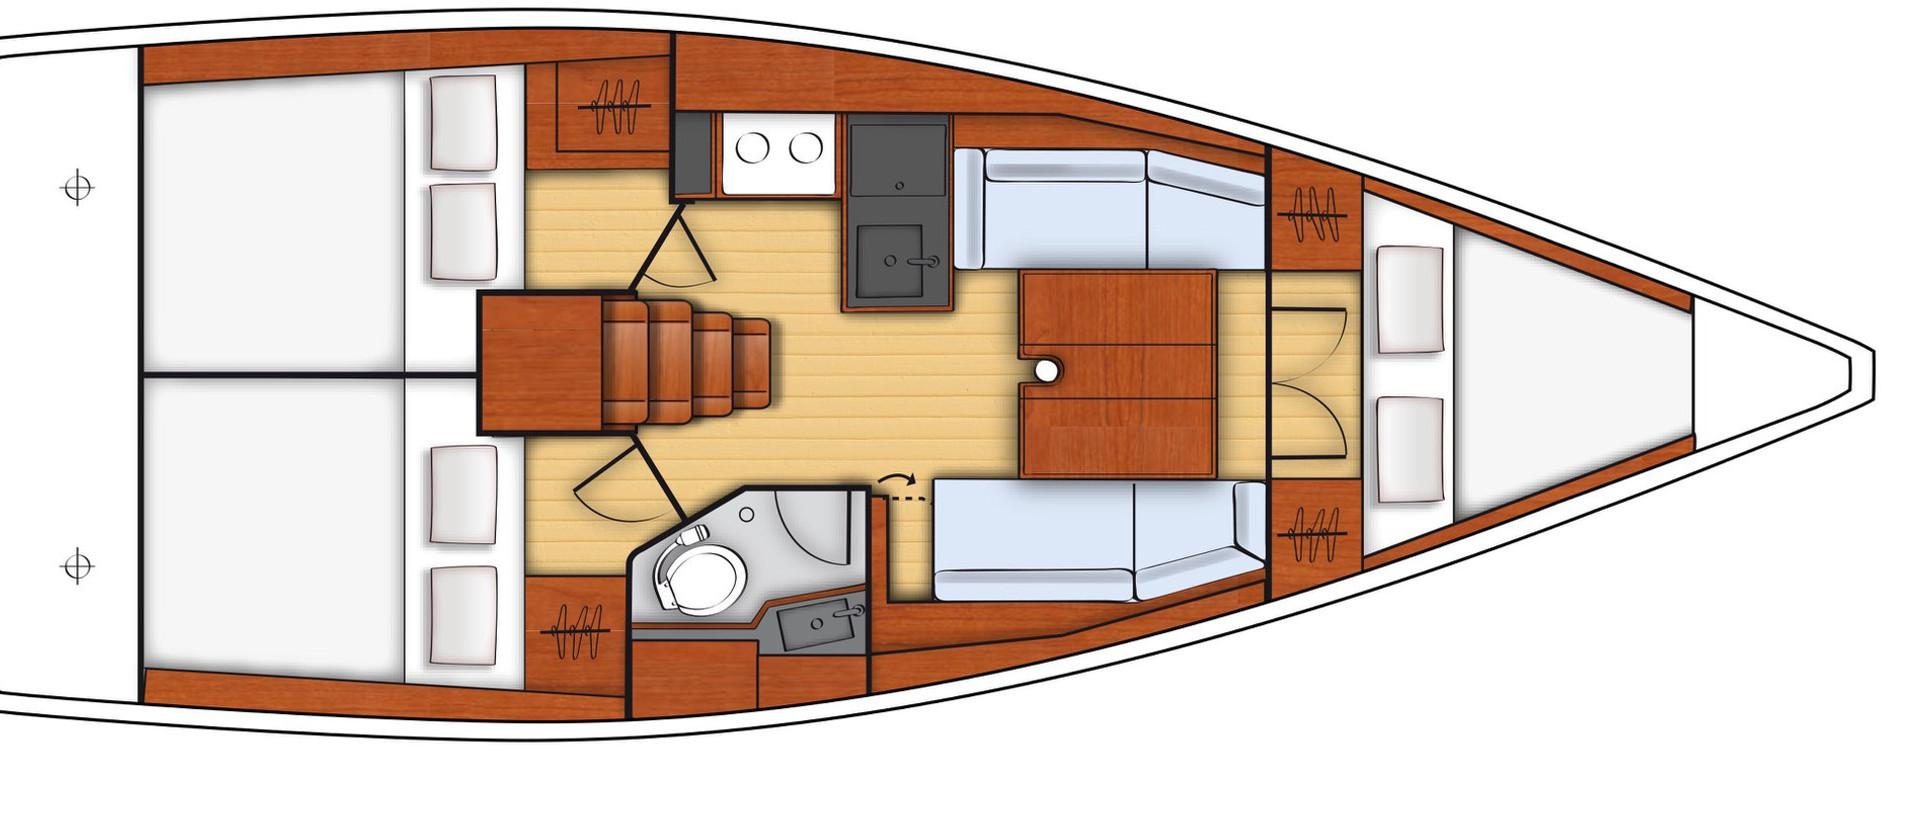 Sailing experience in sardinia